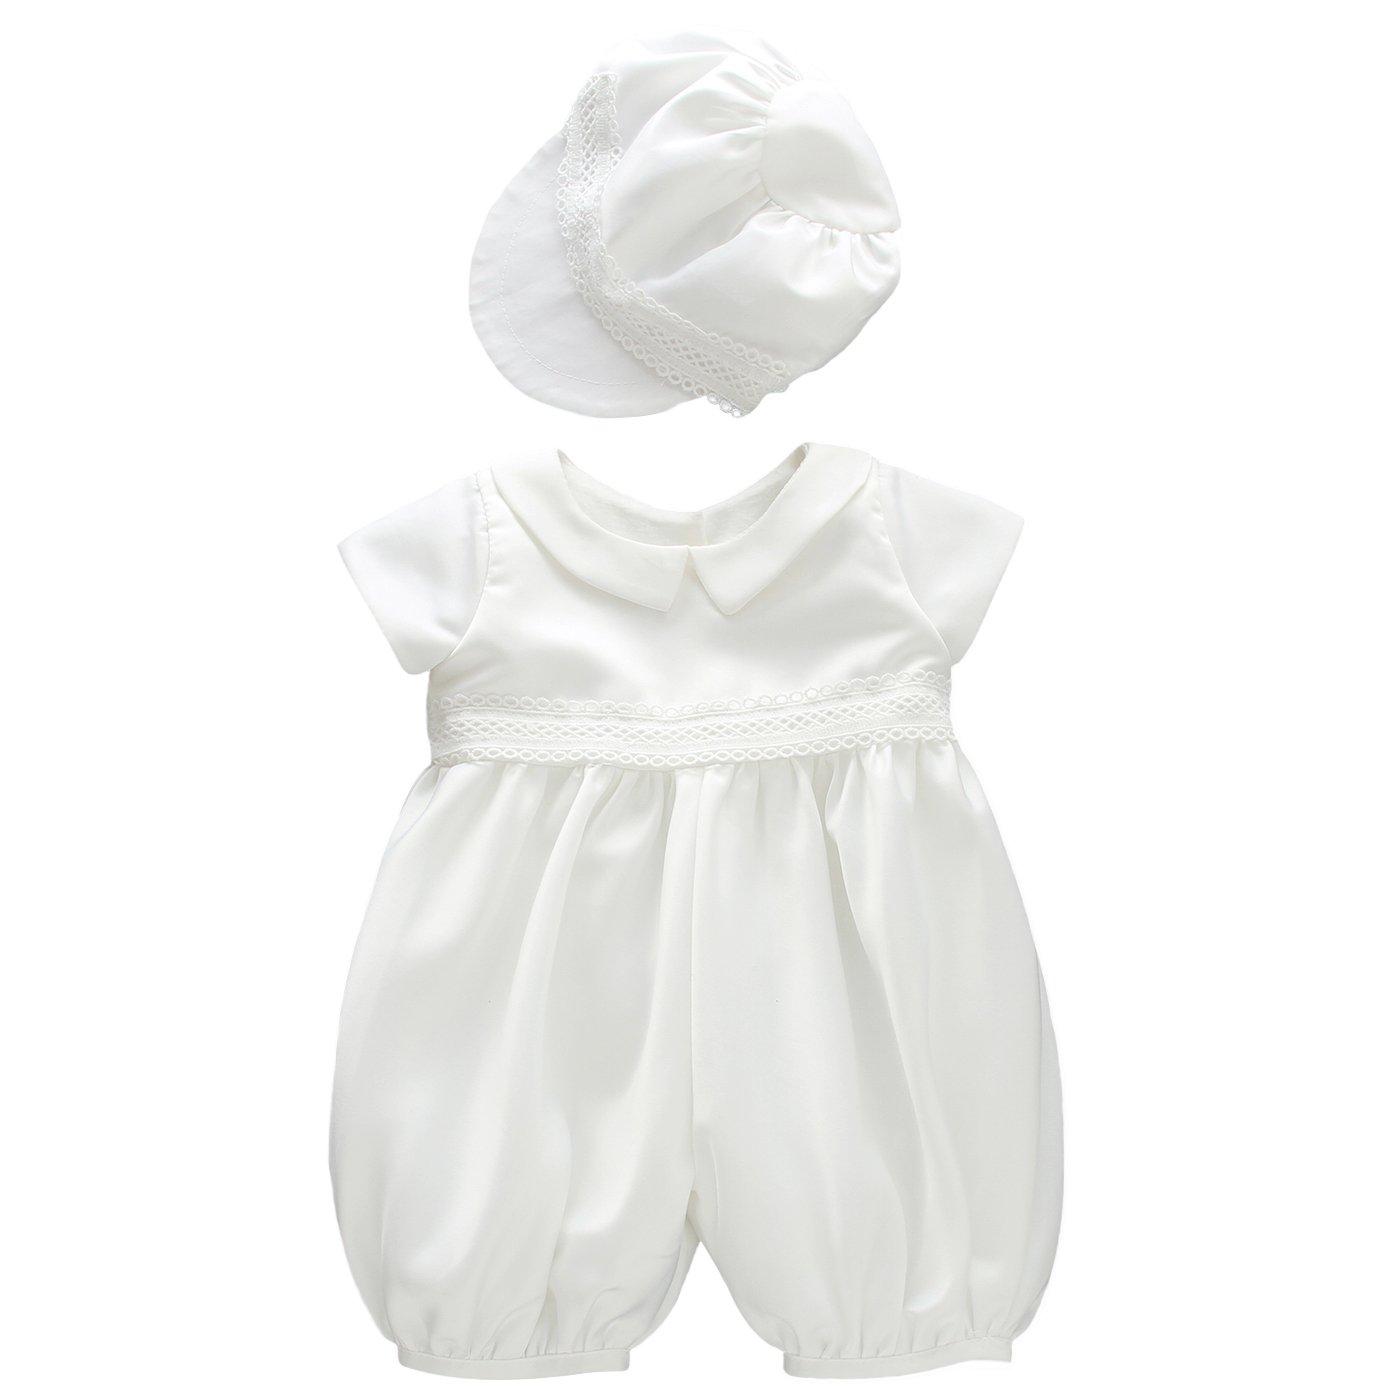 Glamulice Infant Baby Boy Christening Baptism Outfit Christening Romper Baptism Clothes